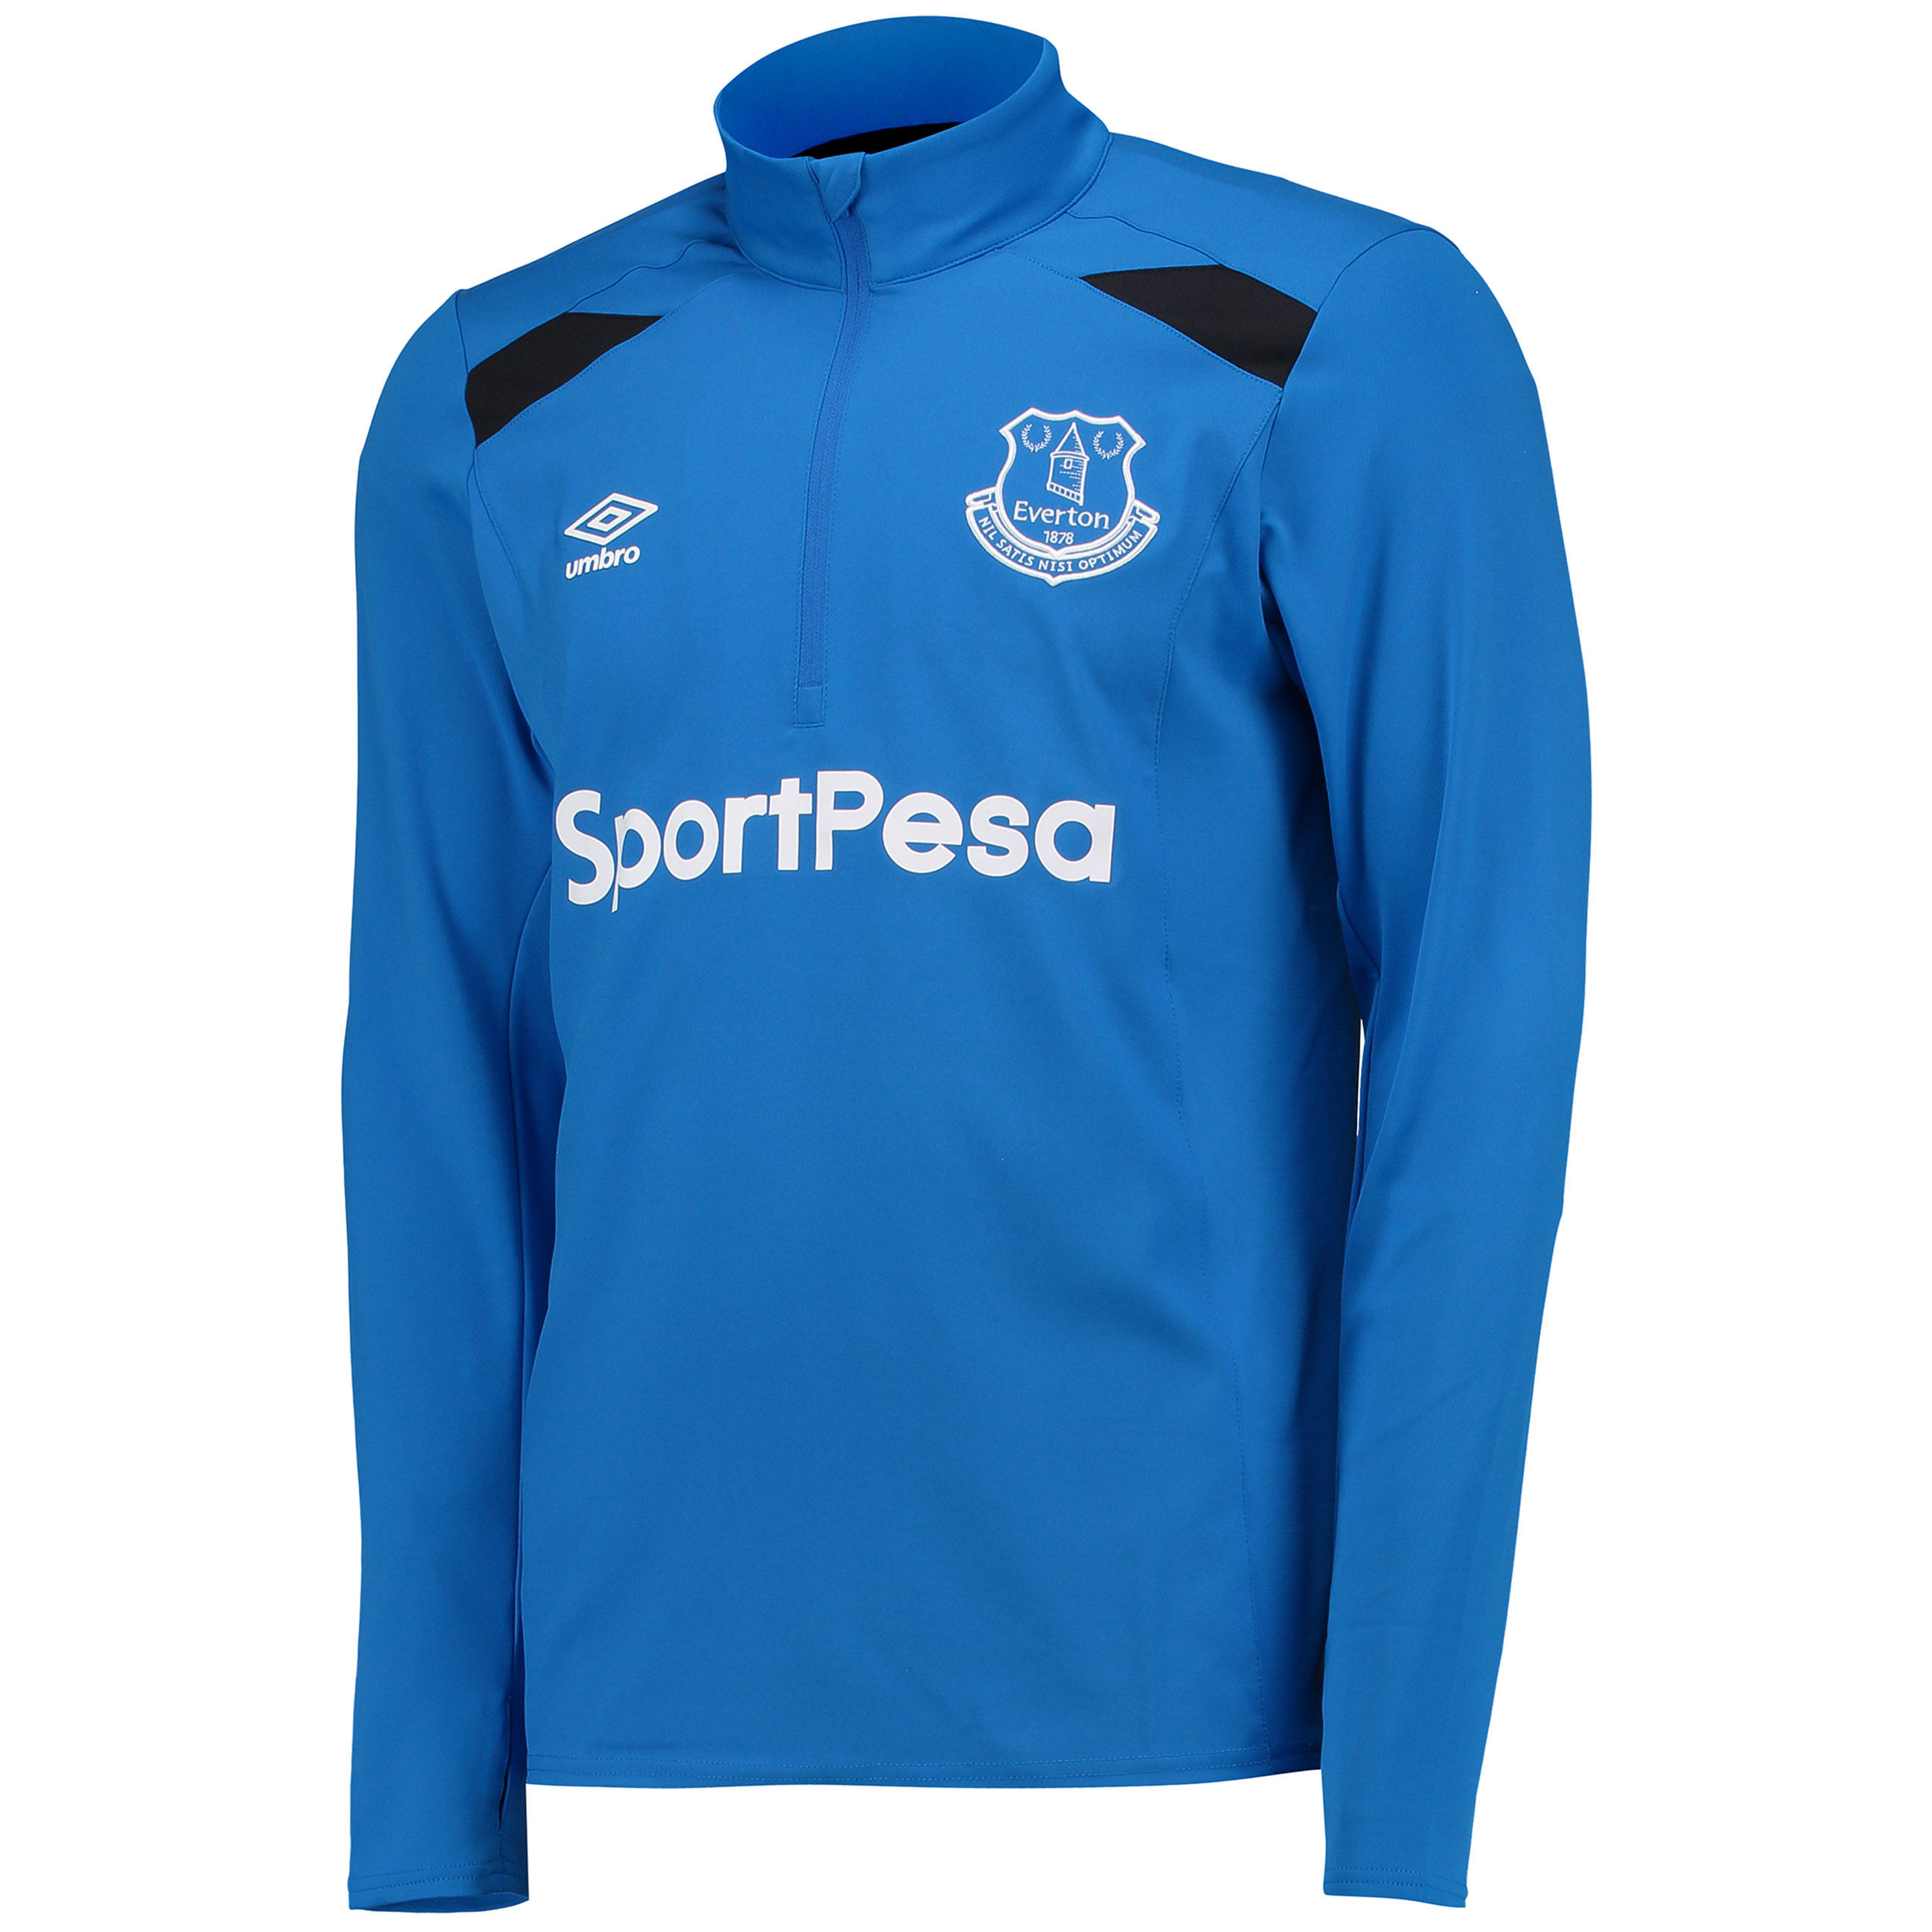 Everton Training Half Zip Top - Electric Blue/Black